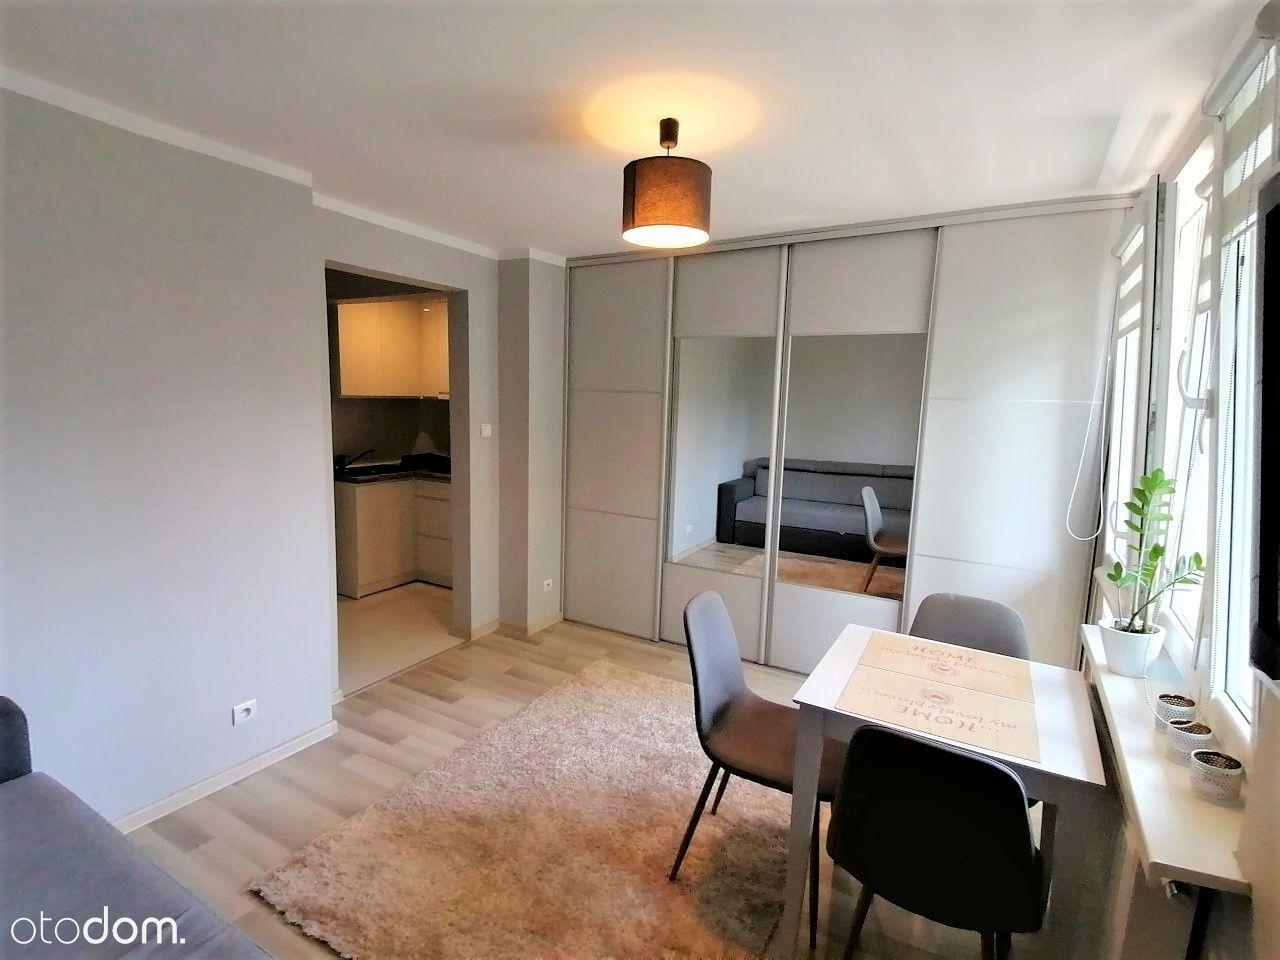 Przytulne mieszkanie 19,89m2+balkon blisko centrum